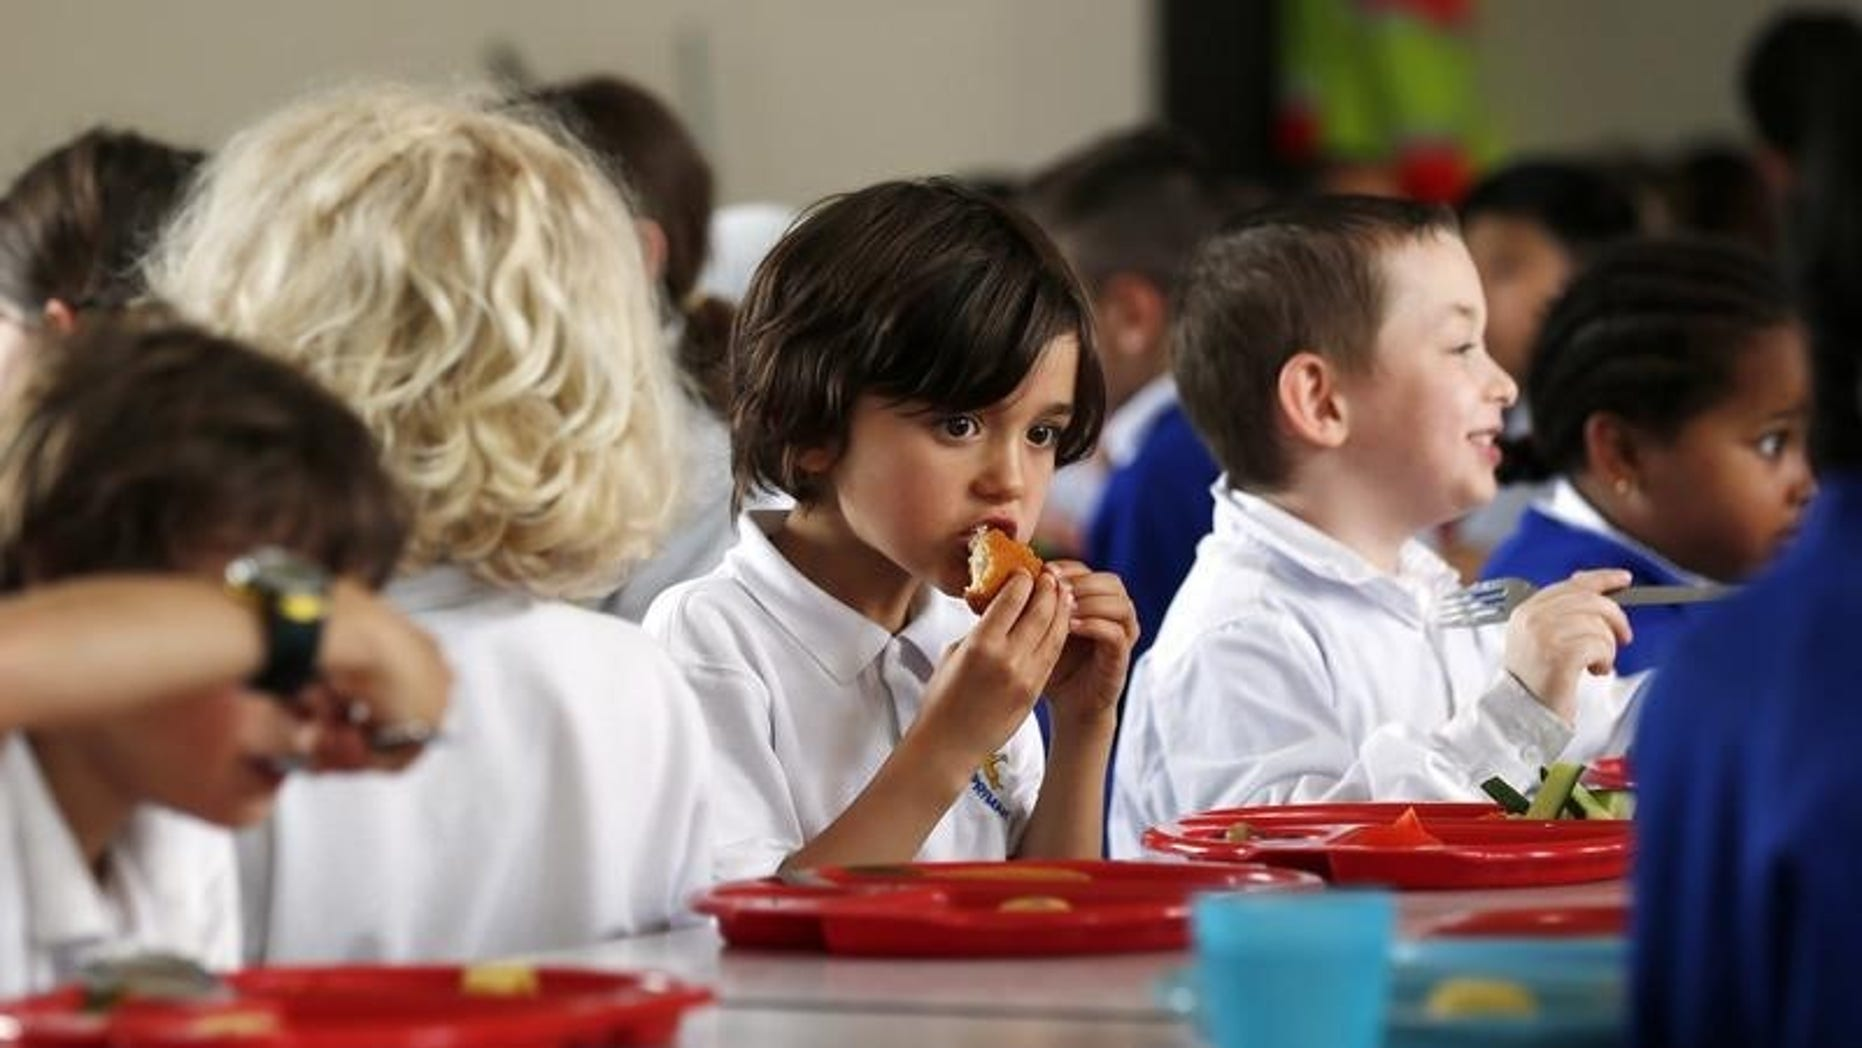 Students eat lunch at Salusbury Primary School in northwest London June 11, 2014.  REUTERS/Suzanne Plunkett